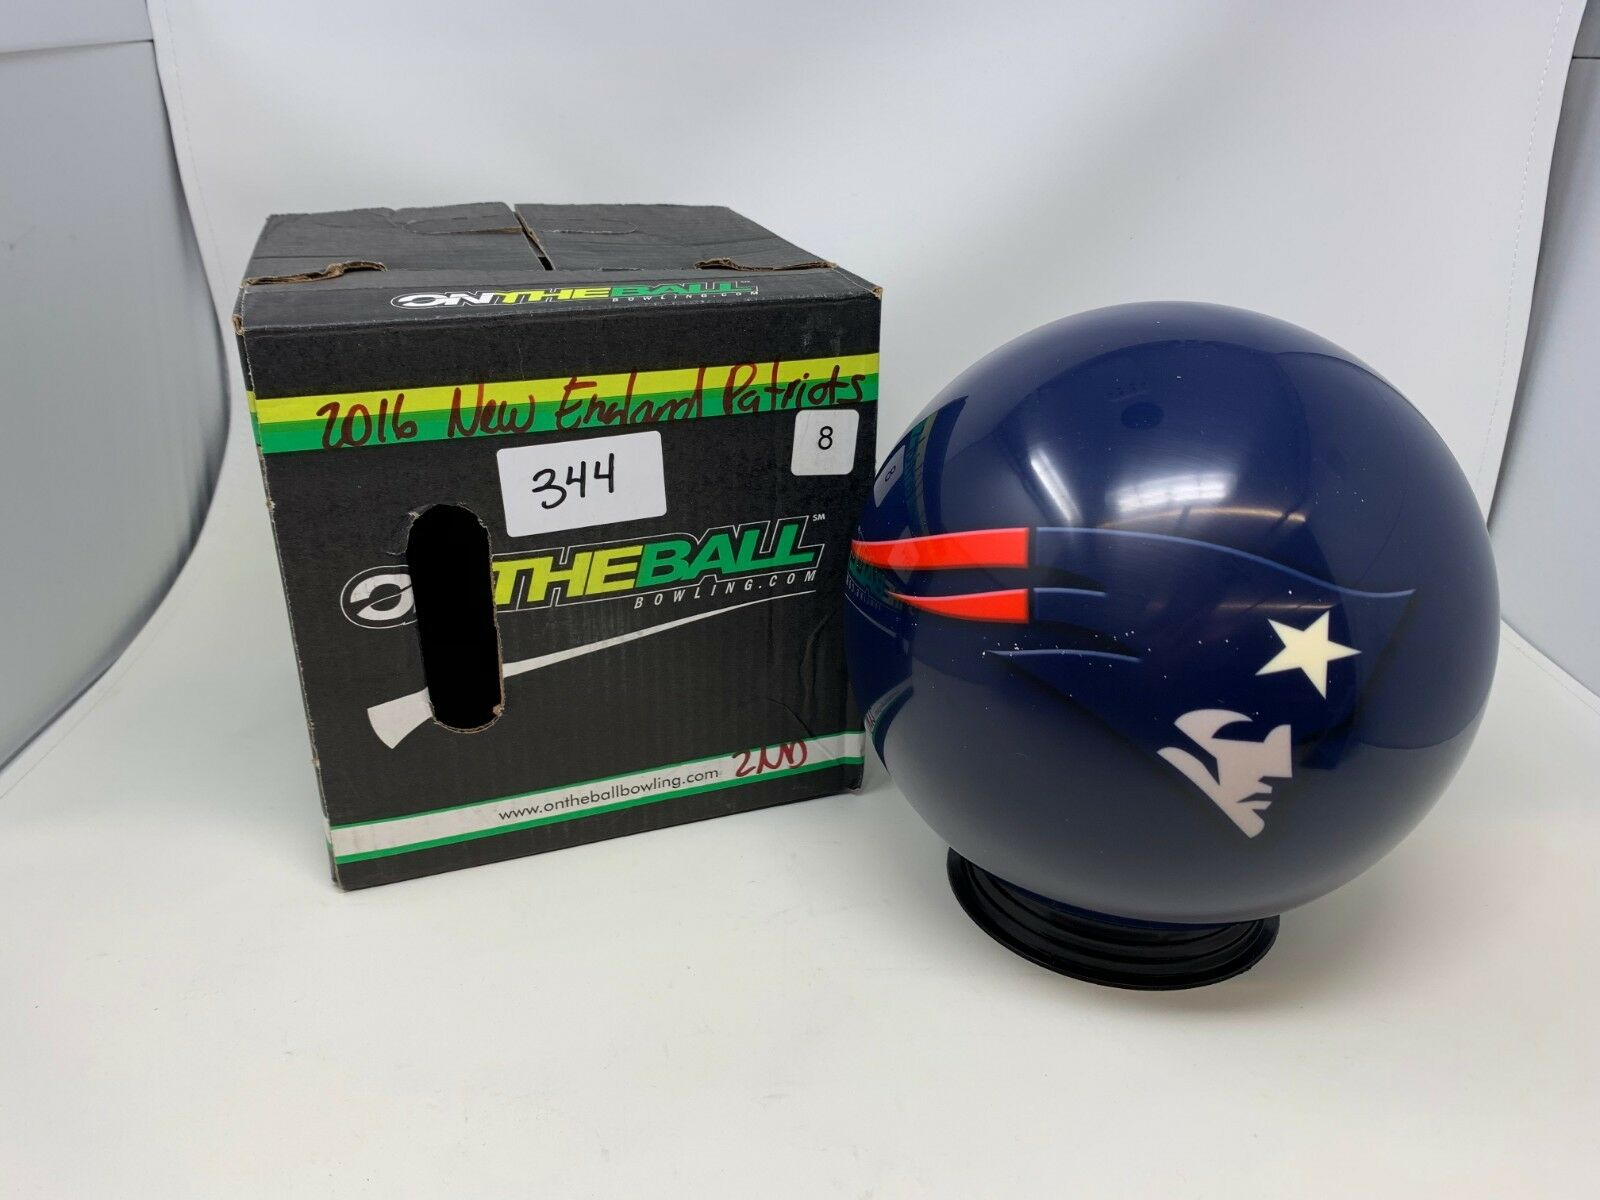 New OTB NFL New England Patriots 8Bowling Ball Viz-a-Ball (344)